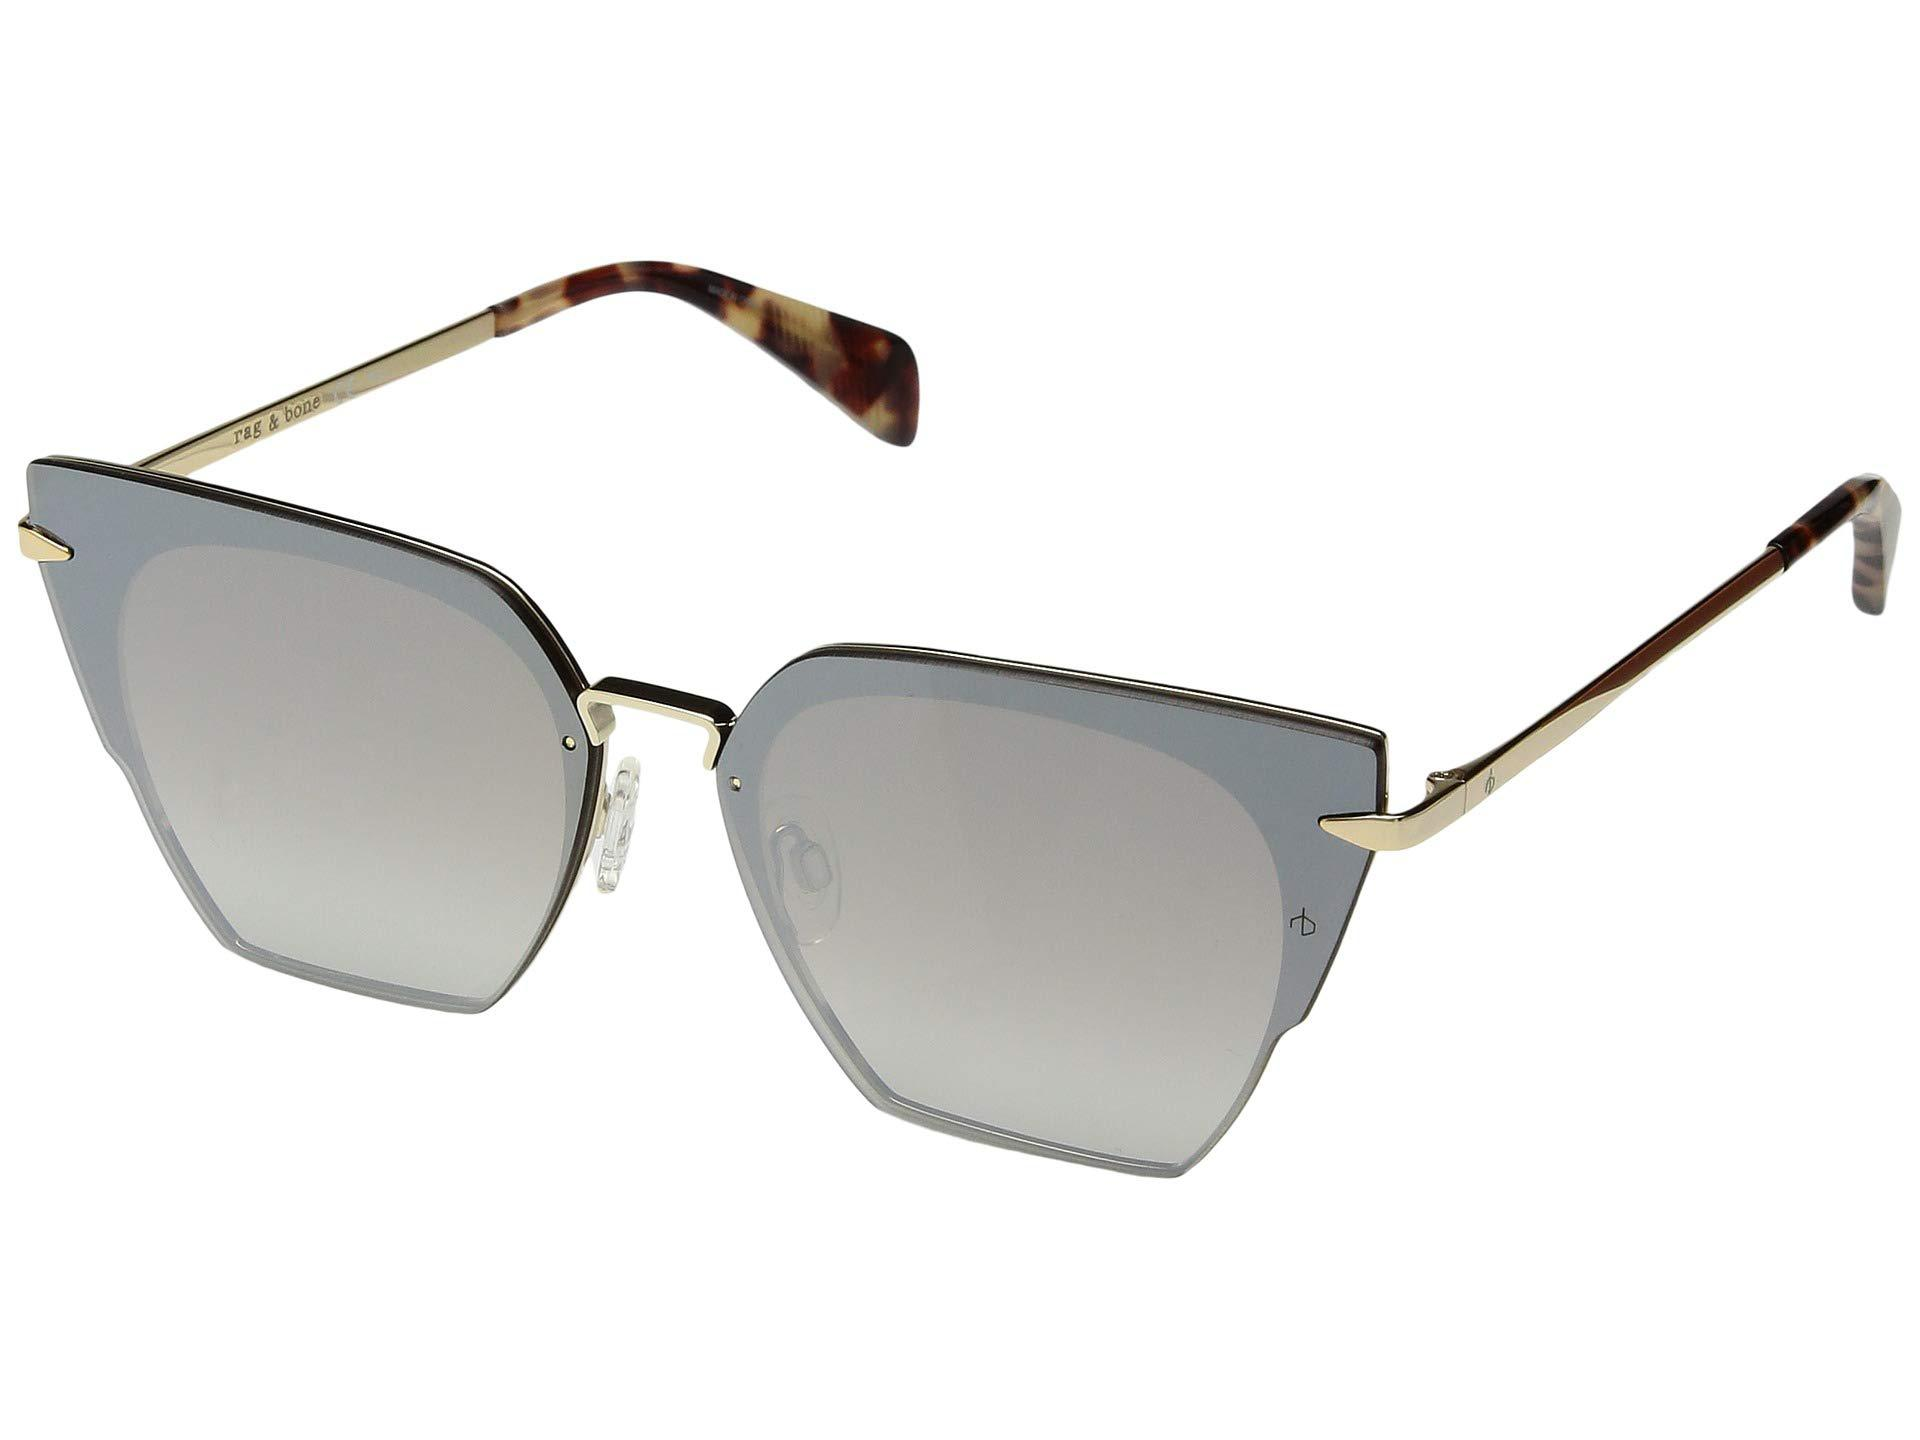 c6c6c6d4662 Rag   Bone - Gray Rnb1016 s (gold grey) Fashion Sunglasses -. View  fullscreen